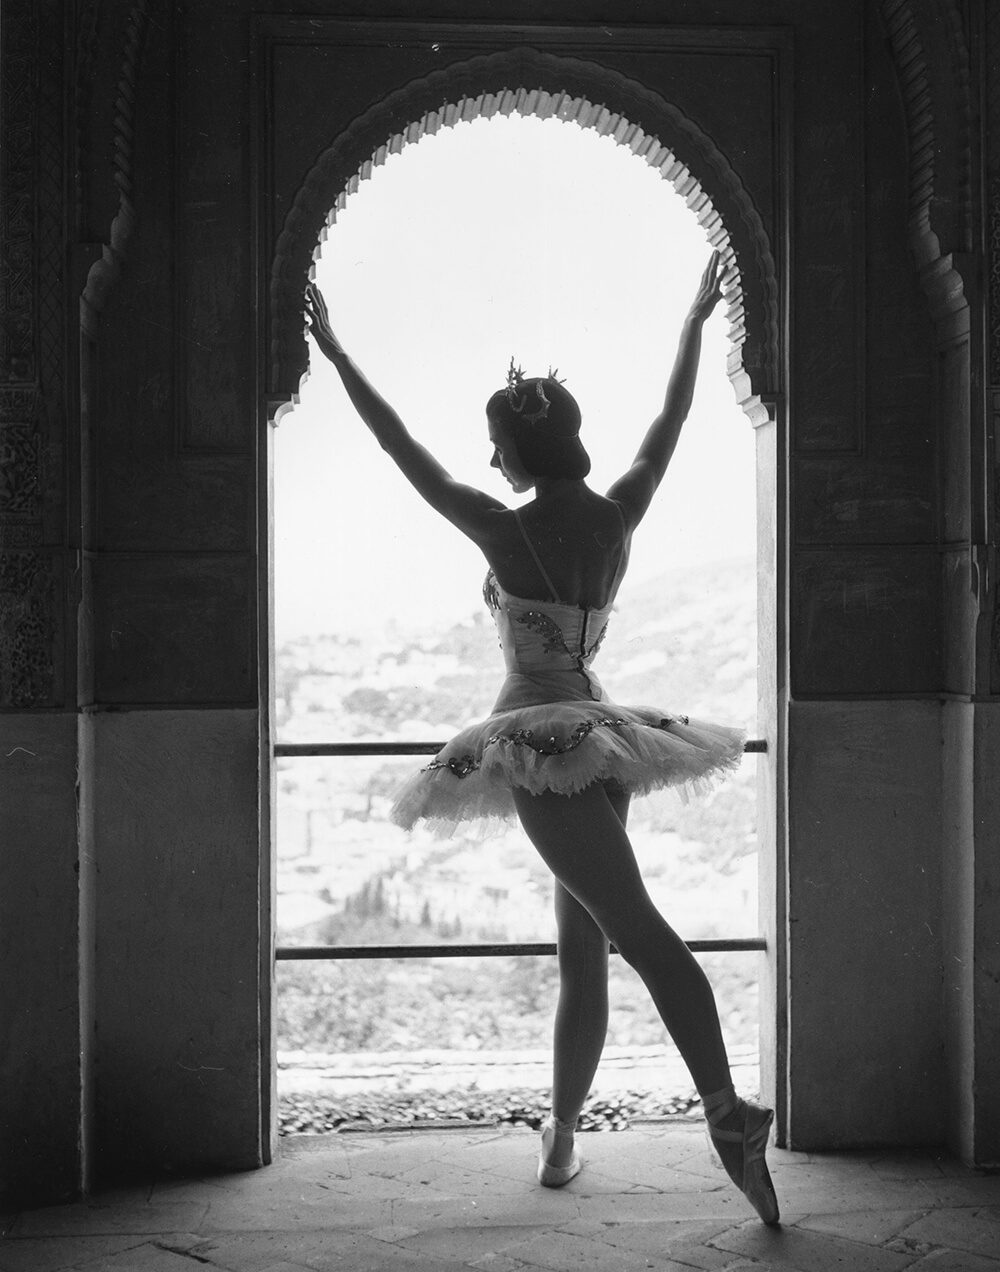 Margot Fonteyn fine art photography